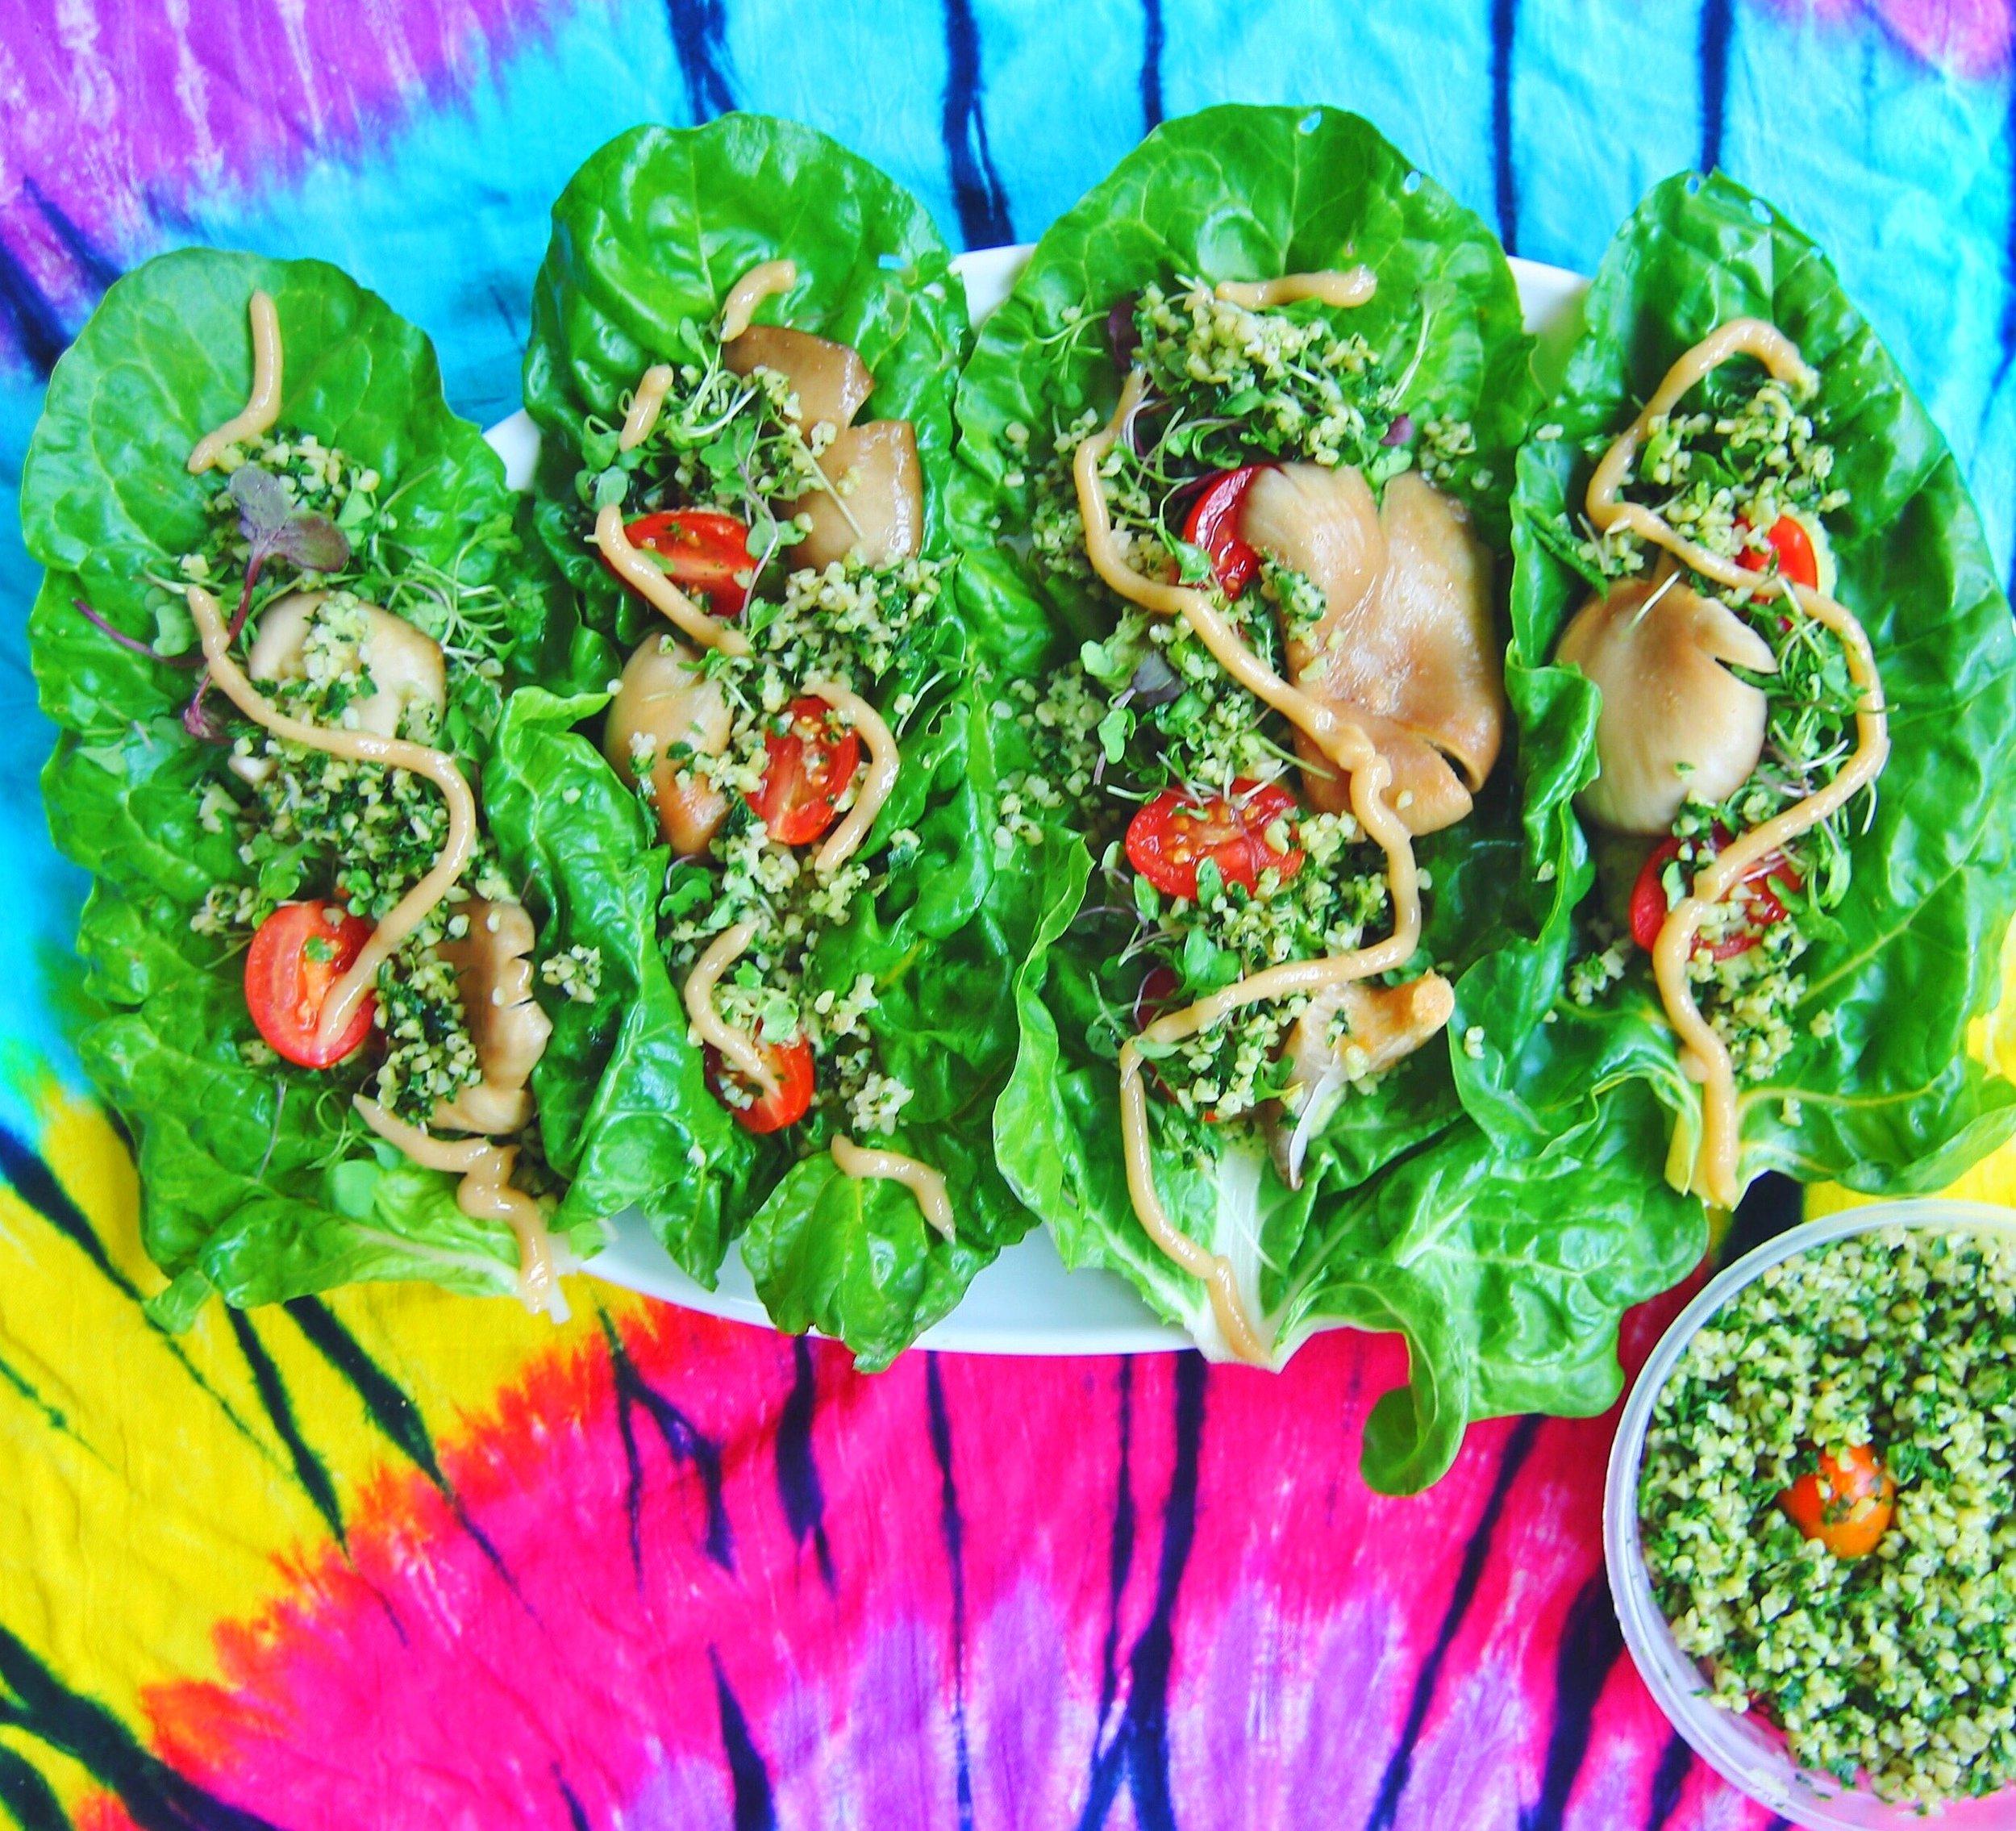 Rainbow Chard Raw Tacos with Marinated Oyster Mushrooms